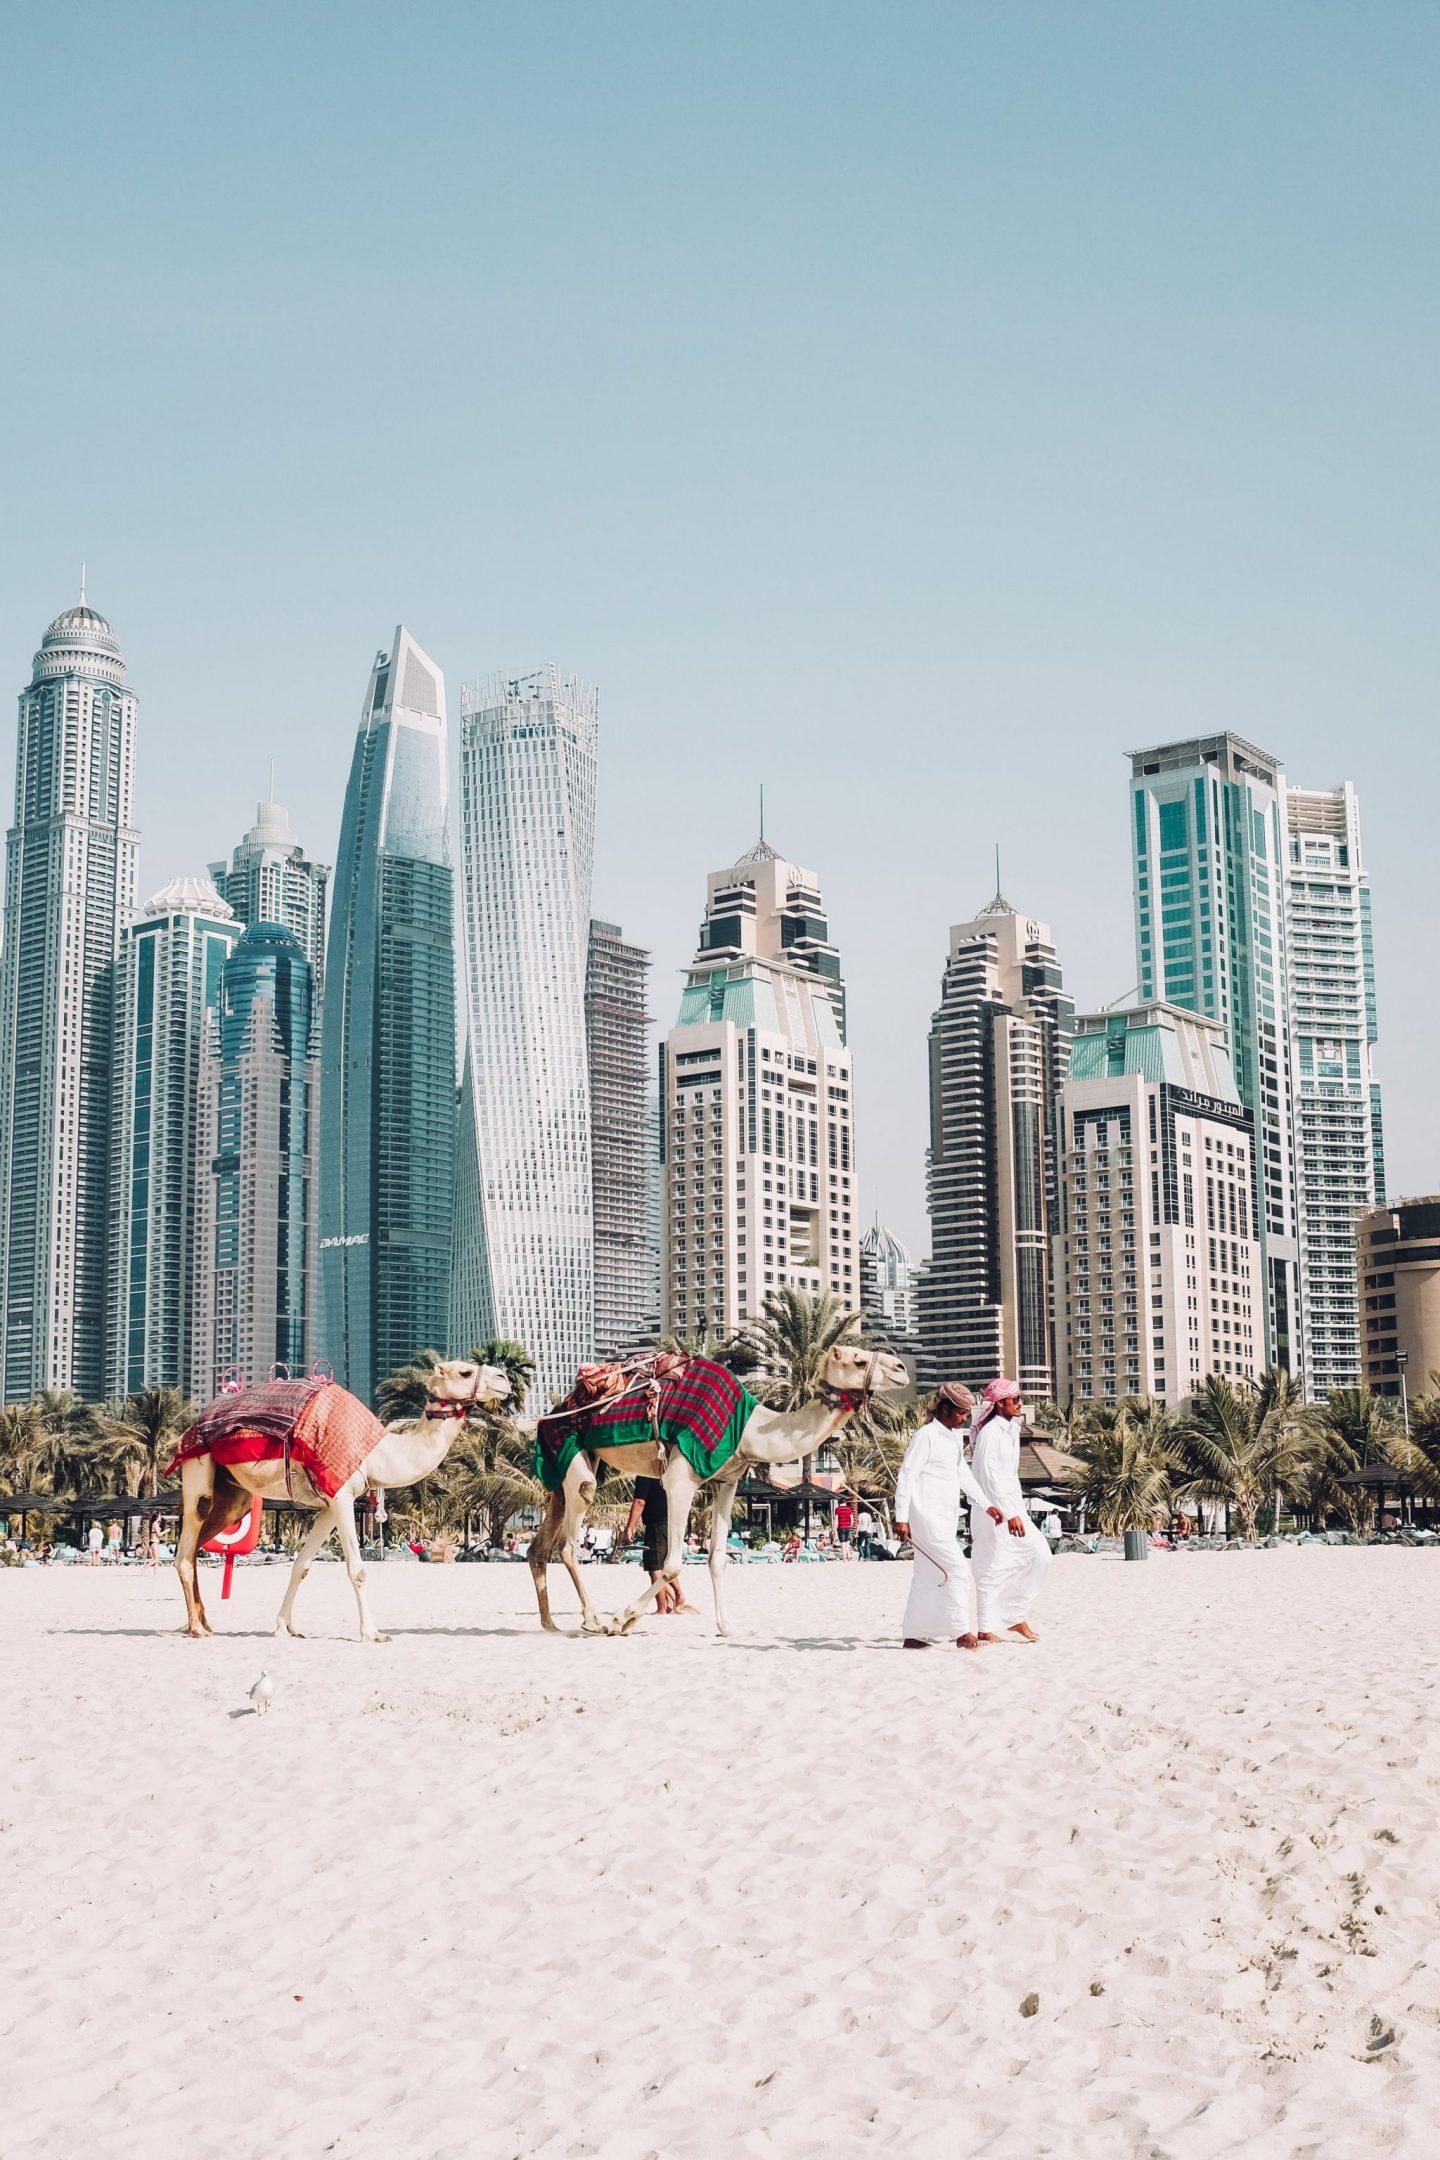 TOP 6 COMMUNITIES TO LIVE IN DUBAI